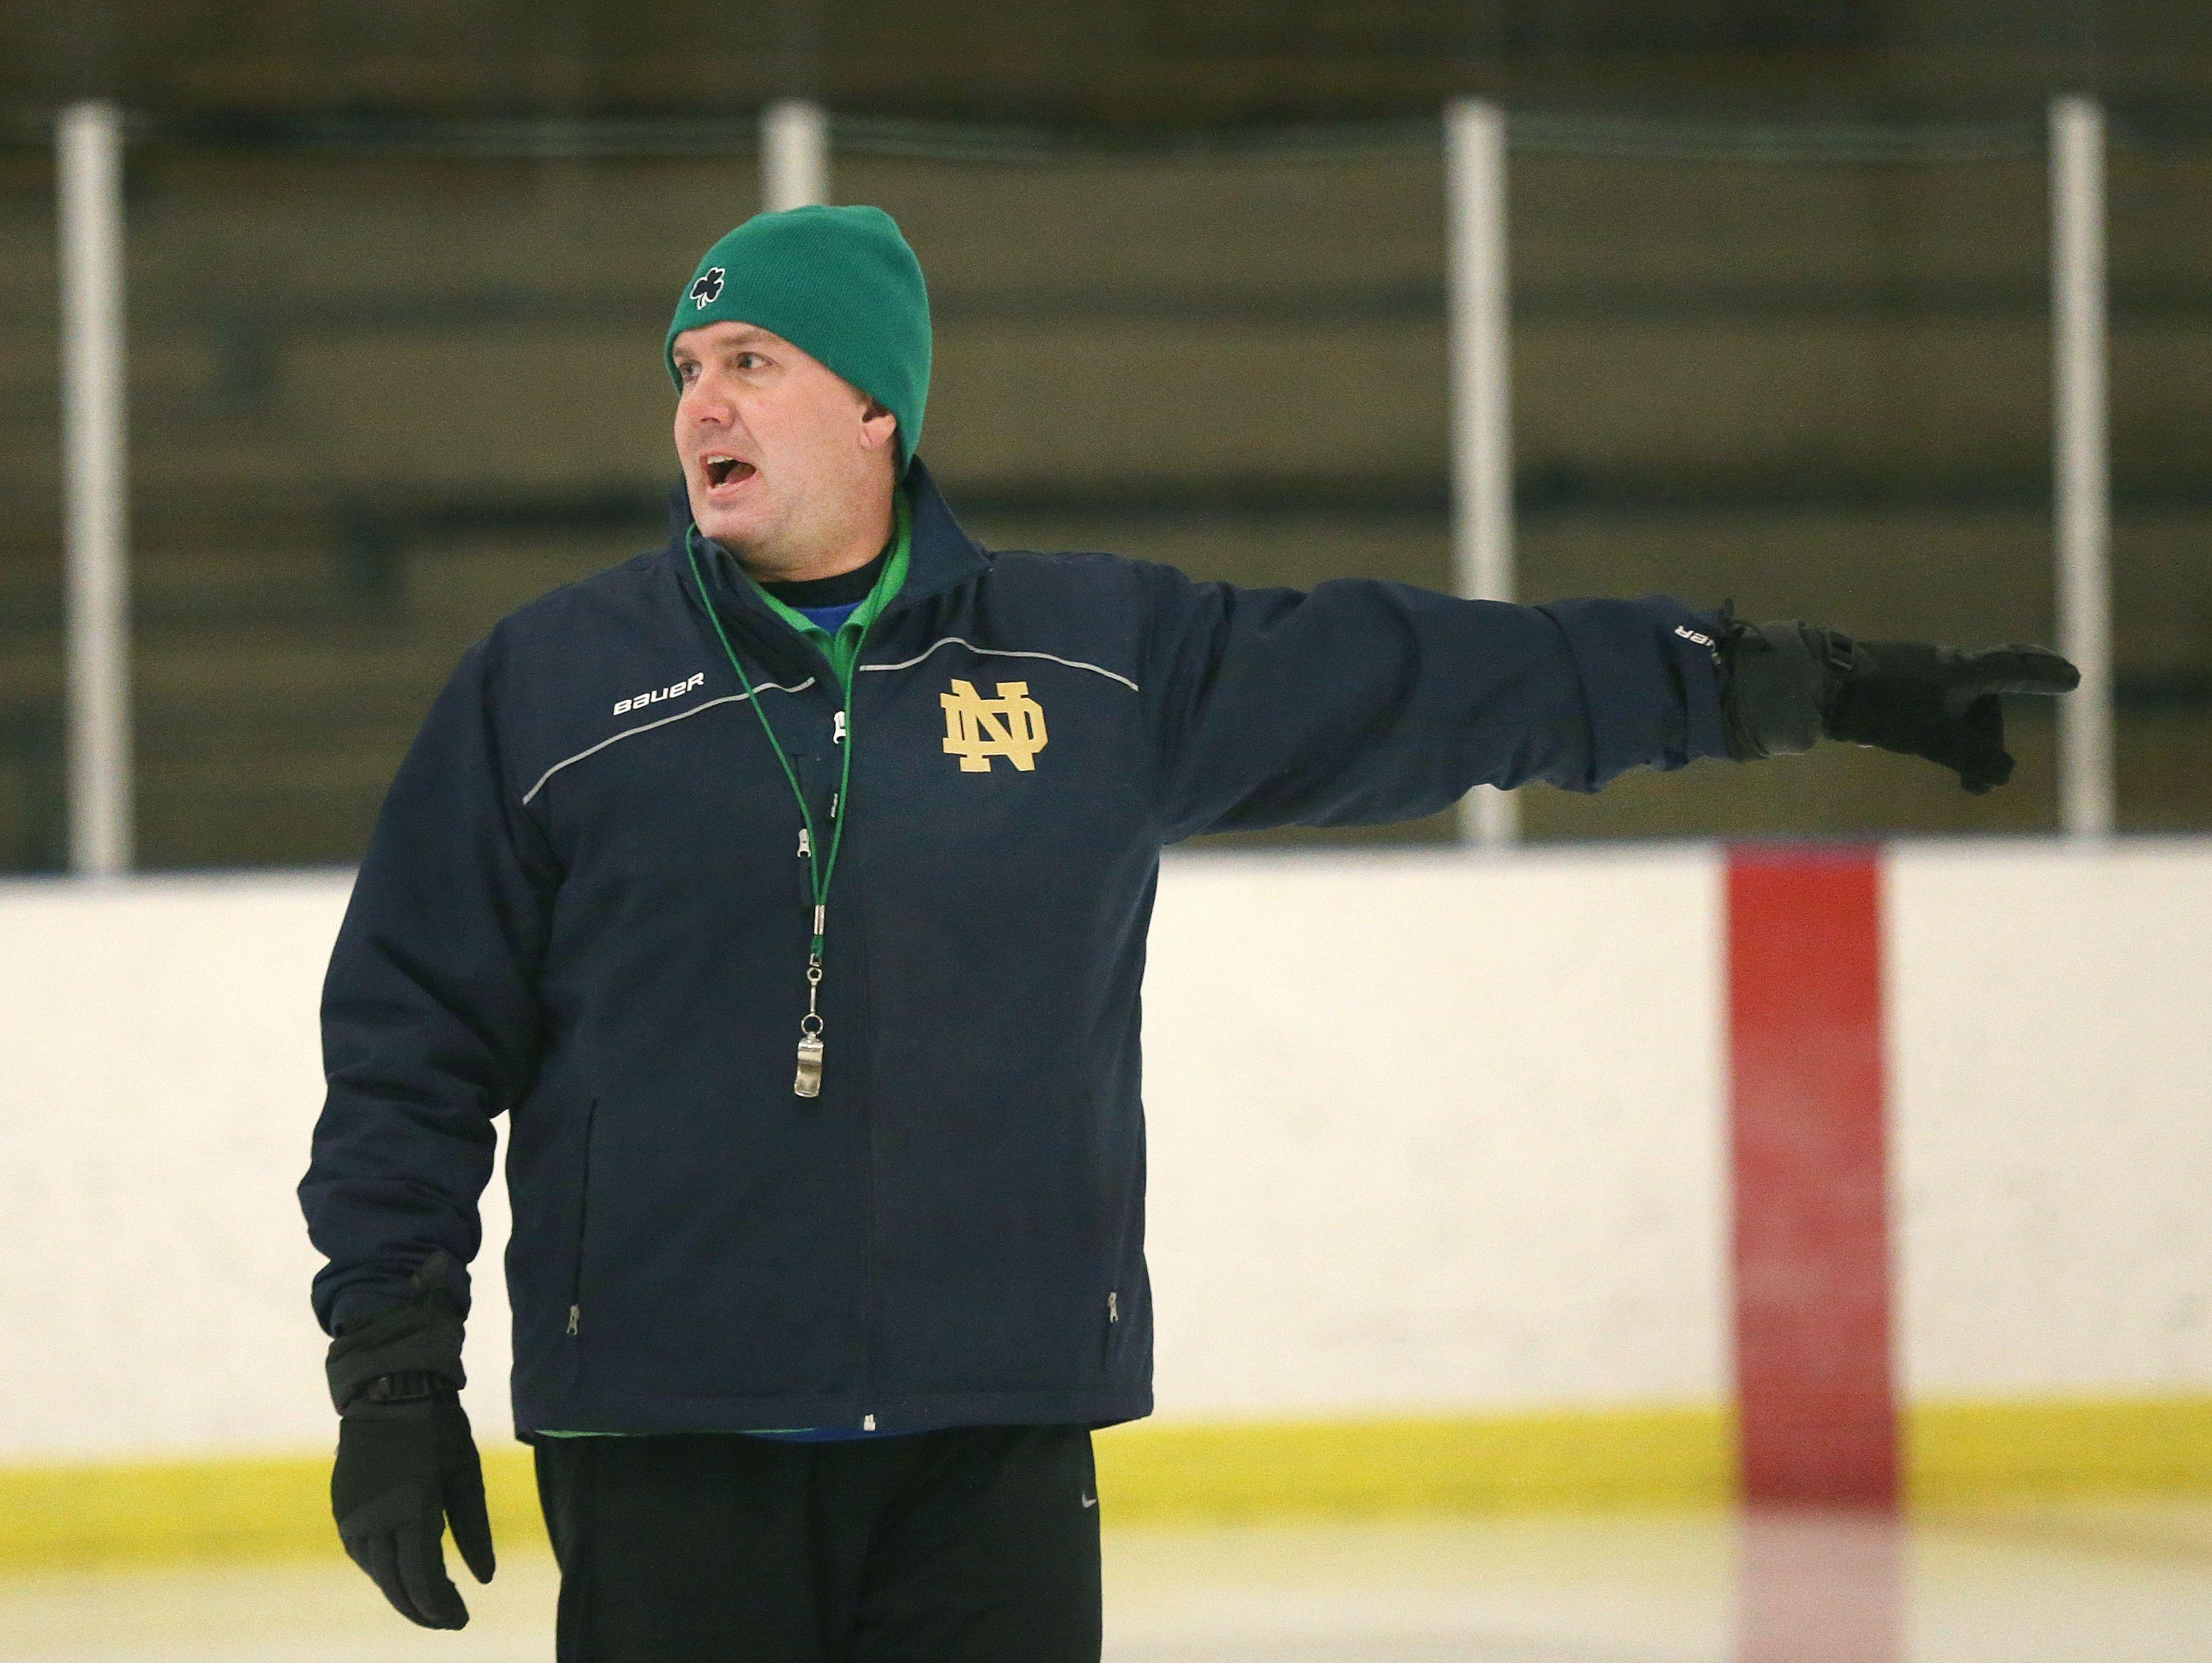 Batavia Notre Dame head coach Marc Staley runs an early-morning practice before school.